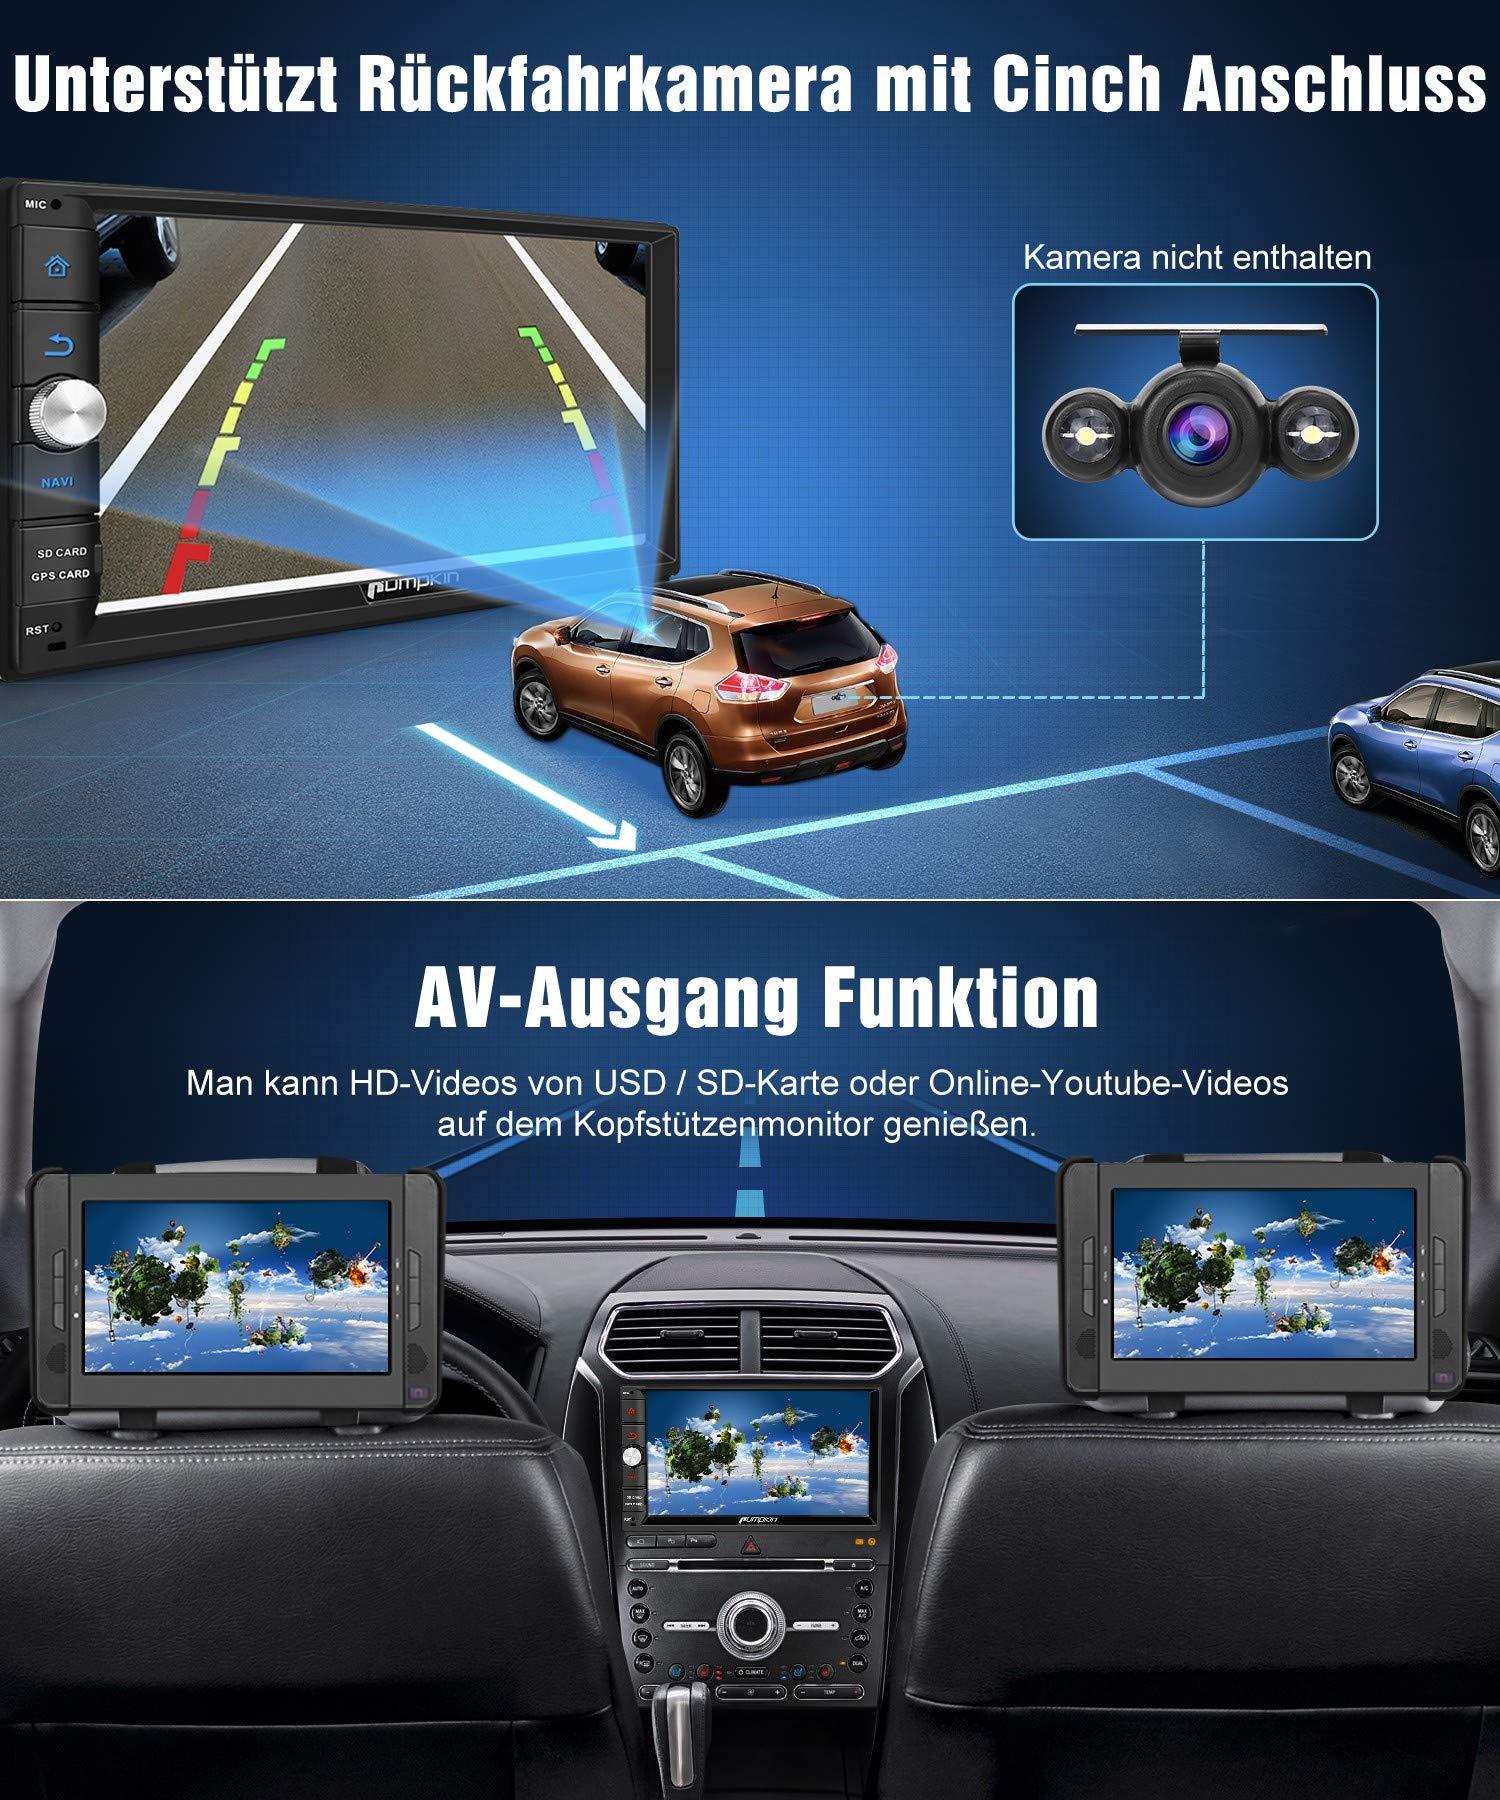 PUMPKIN-Android-90-Autoradio-Moniceiver-mit-Navi-4GB-32GB-Untersttzt-Bluetooth-Tethering-DAB-Android-Auto-WiFi-4G-USB-MicroSD-2-Din-7-Zoll-Bildschirm